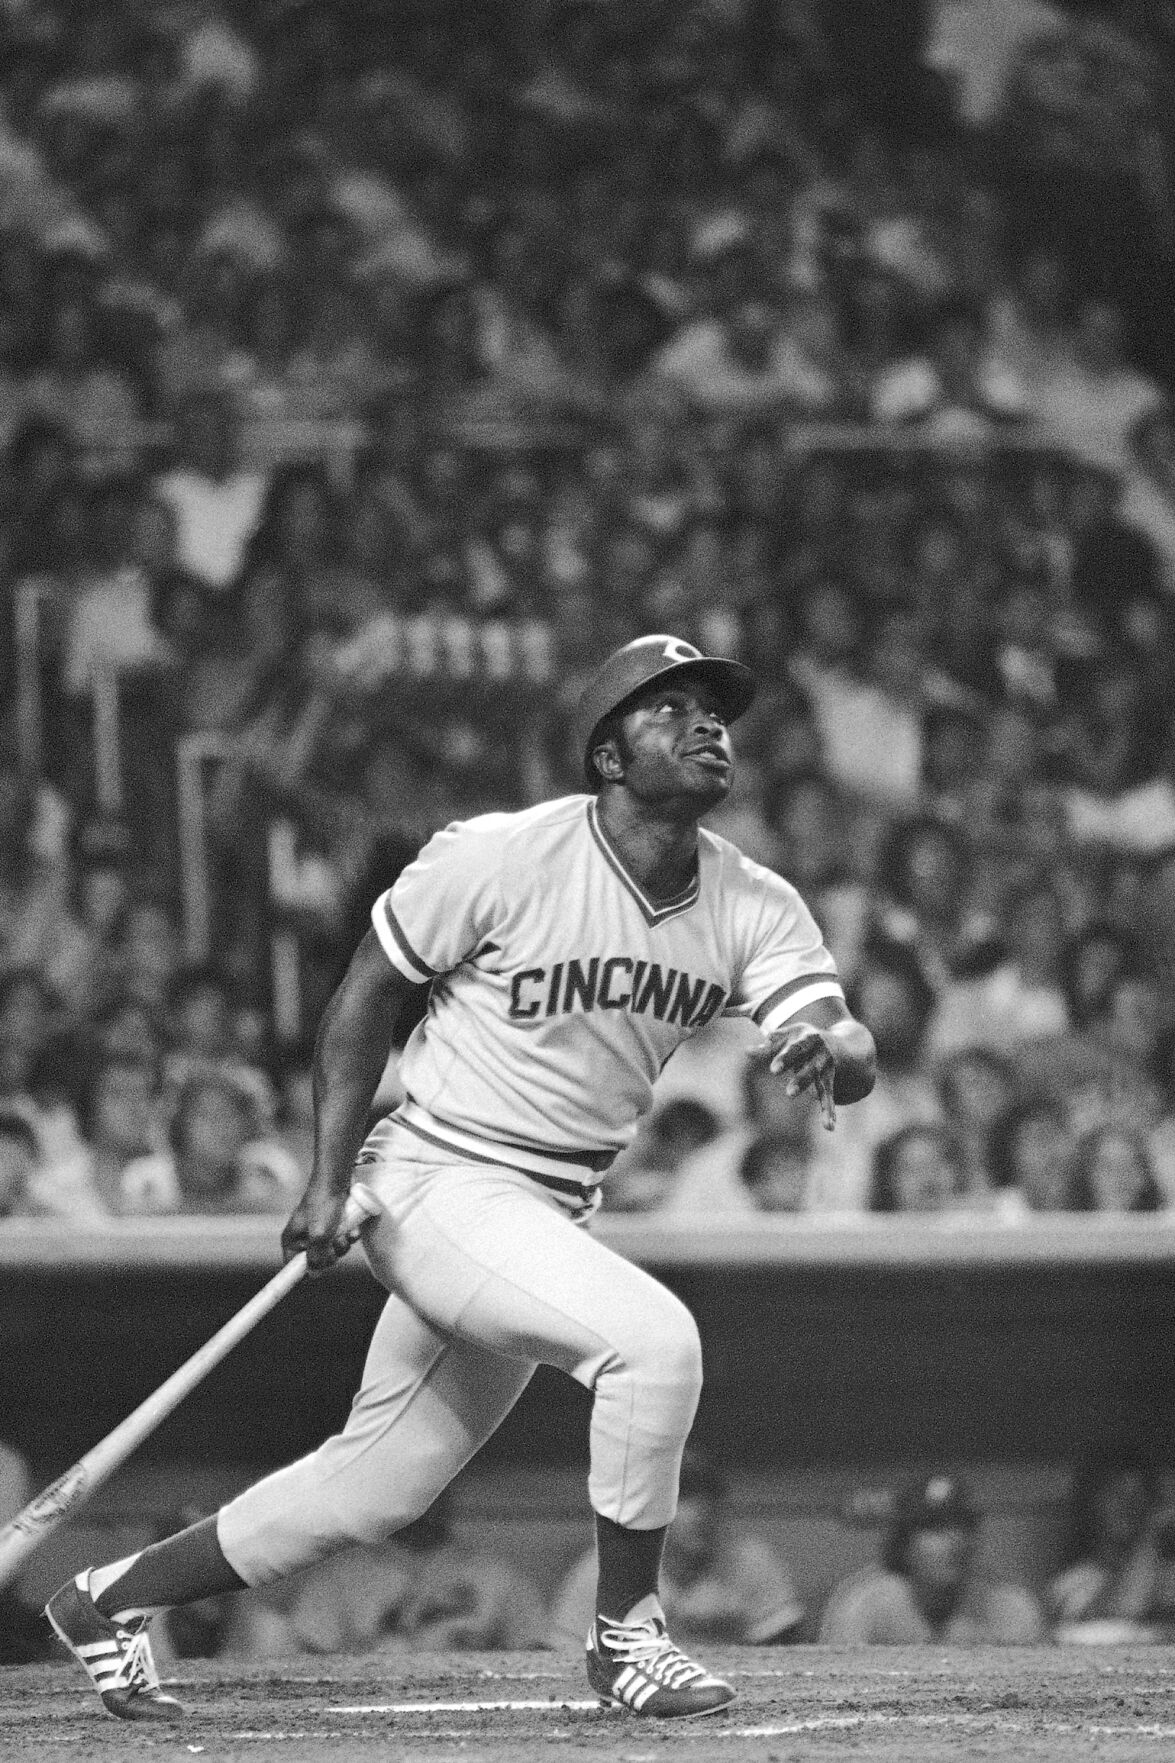 Baseball Hall Of Famer Joe Morgan Dies At 77 Baseball Stltoday Com However, this took courage to pen. baseball hall of famer joe morgan dies